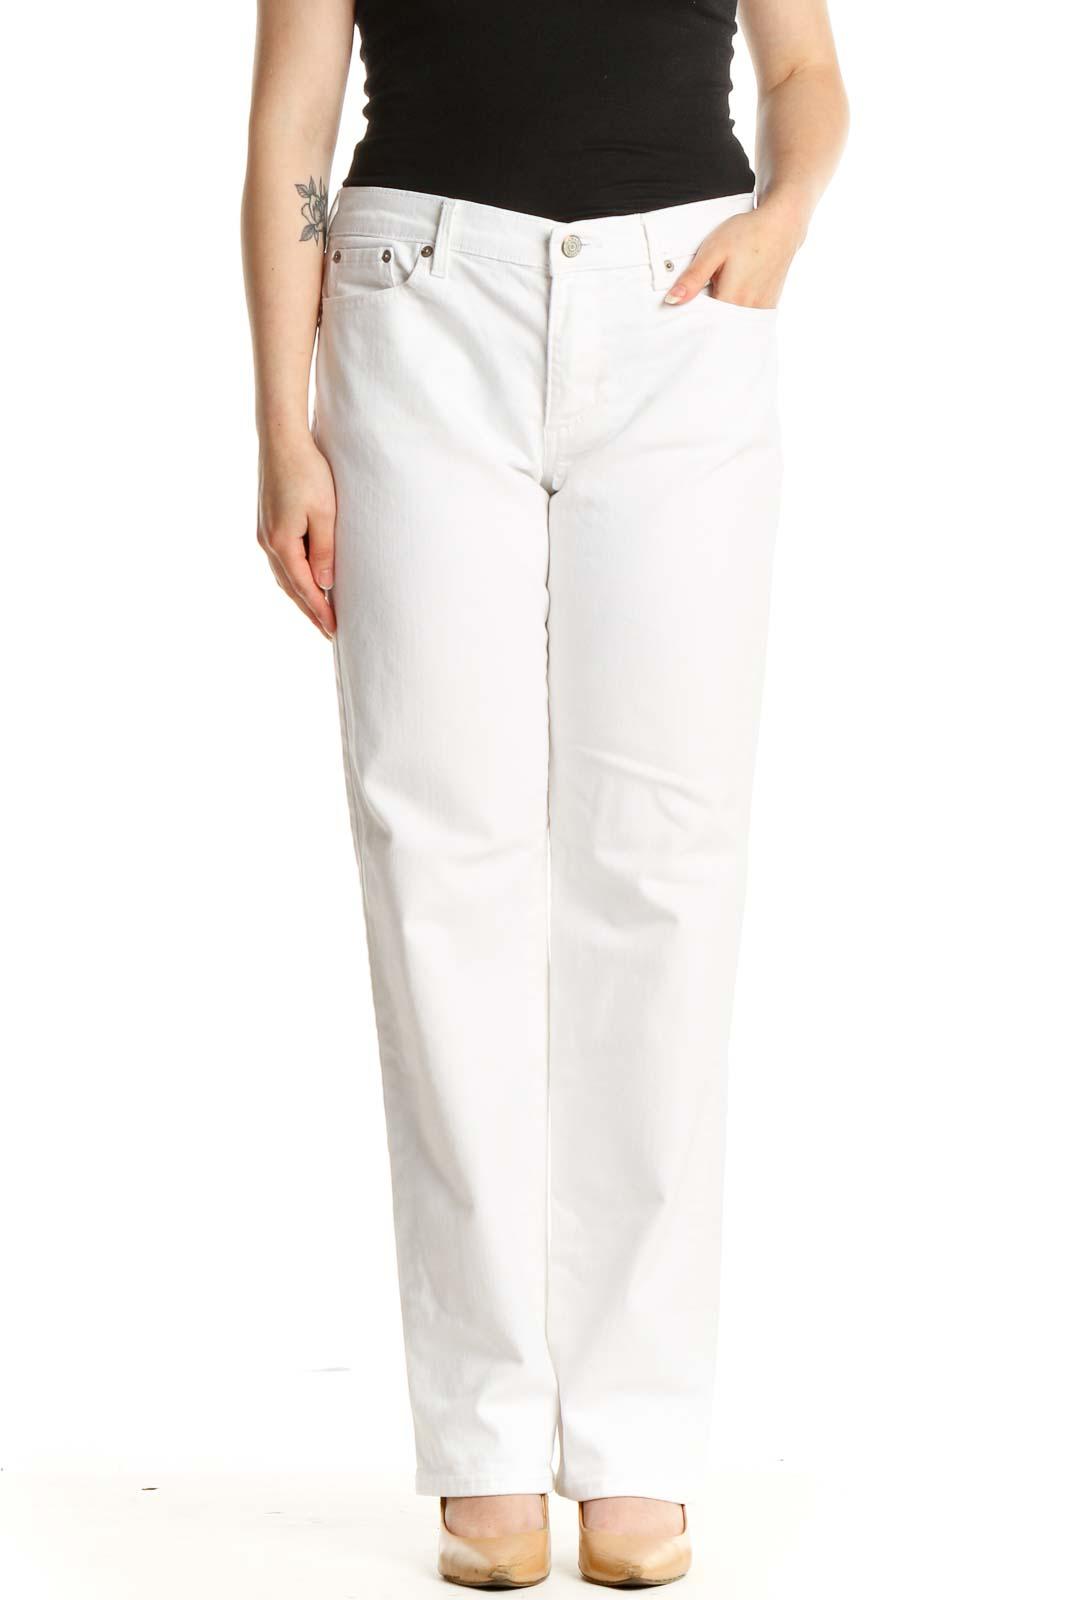 White Straight Leg Jeans Front